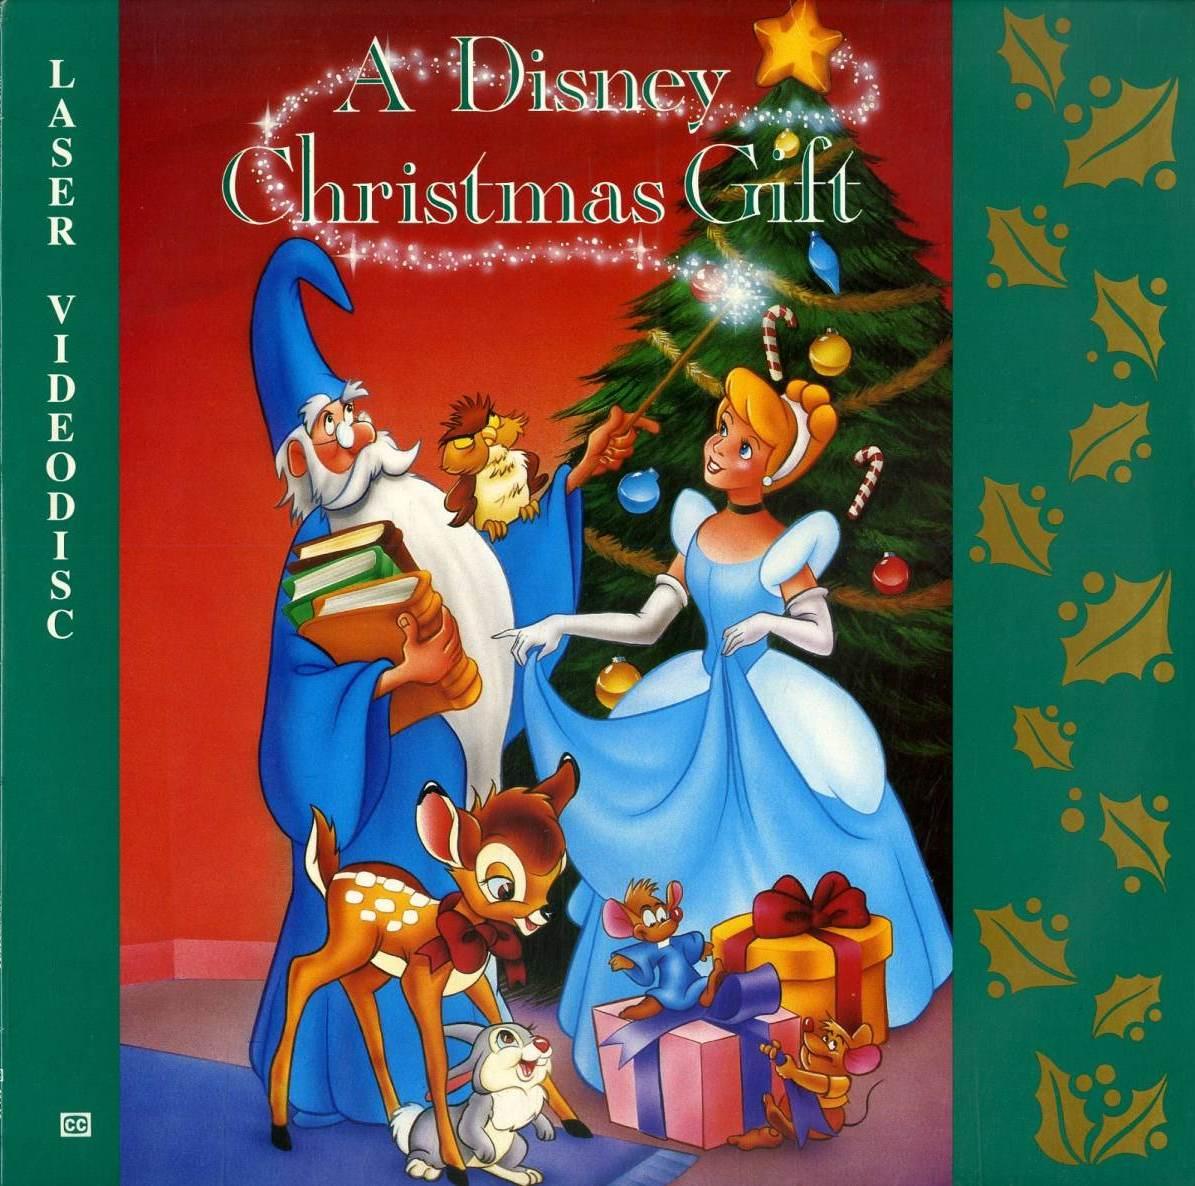 A Disney Christmas Gift - 224 AS - 712257224060 -Disneyinfo.nl